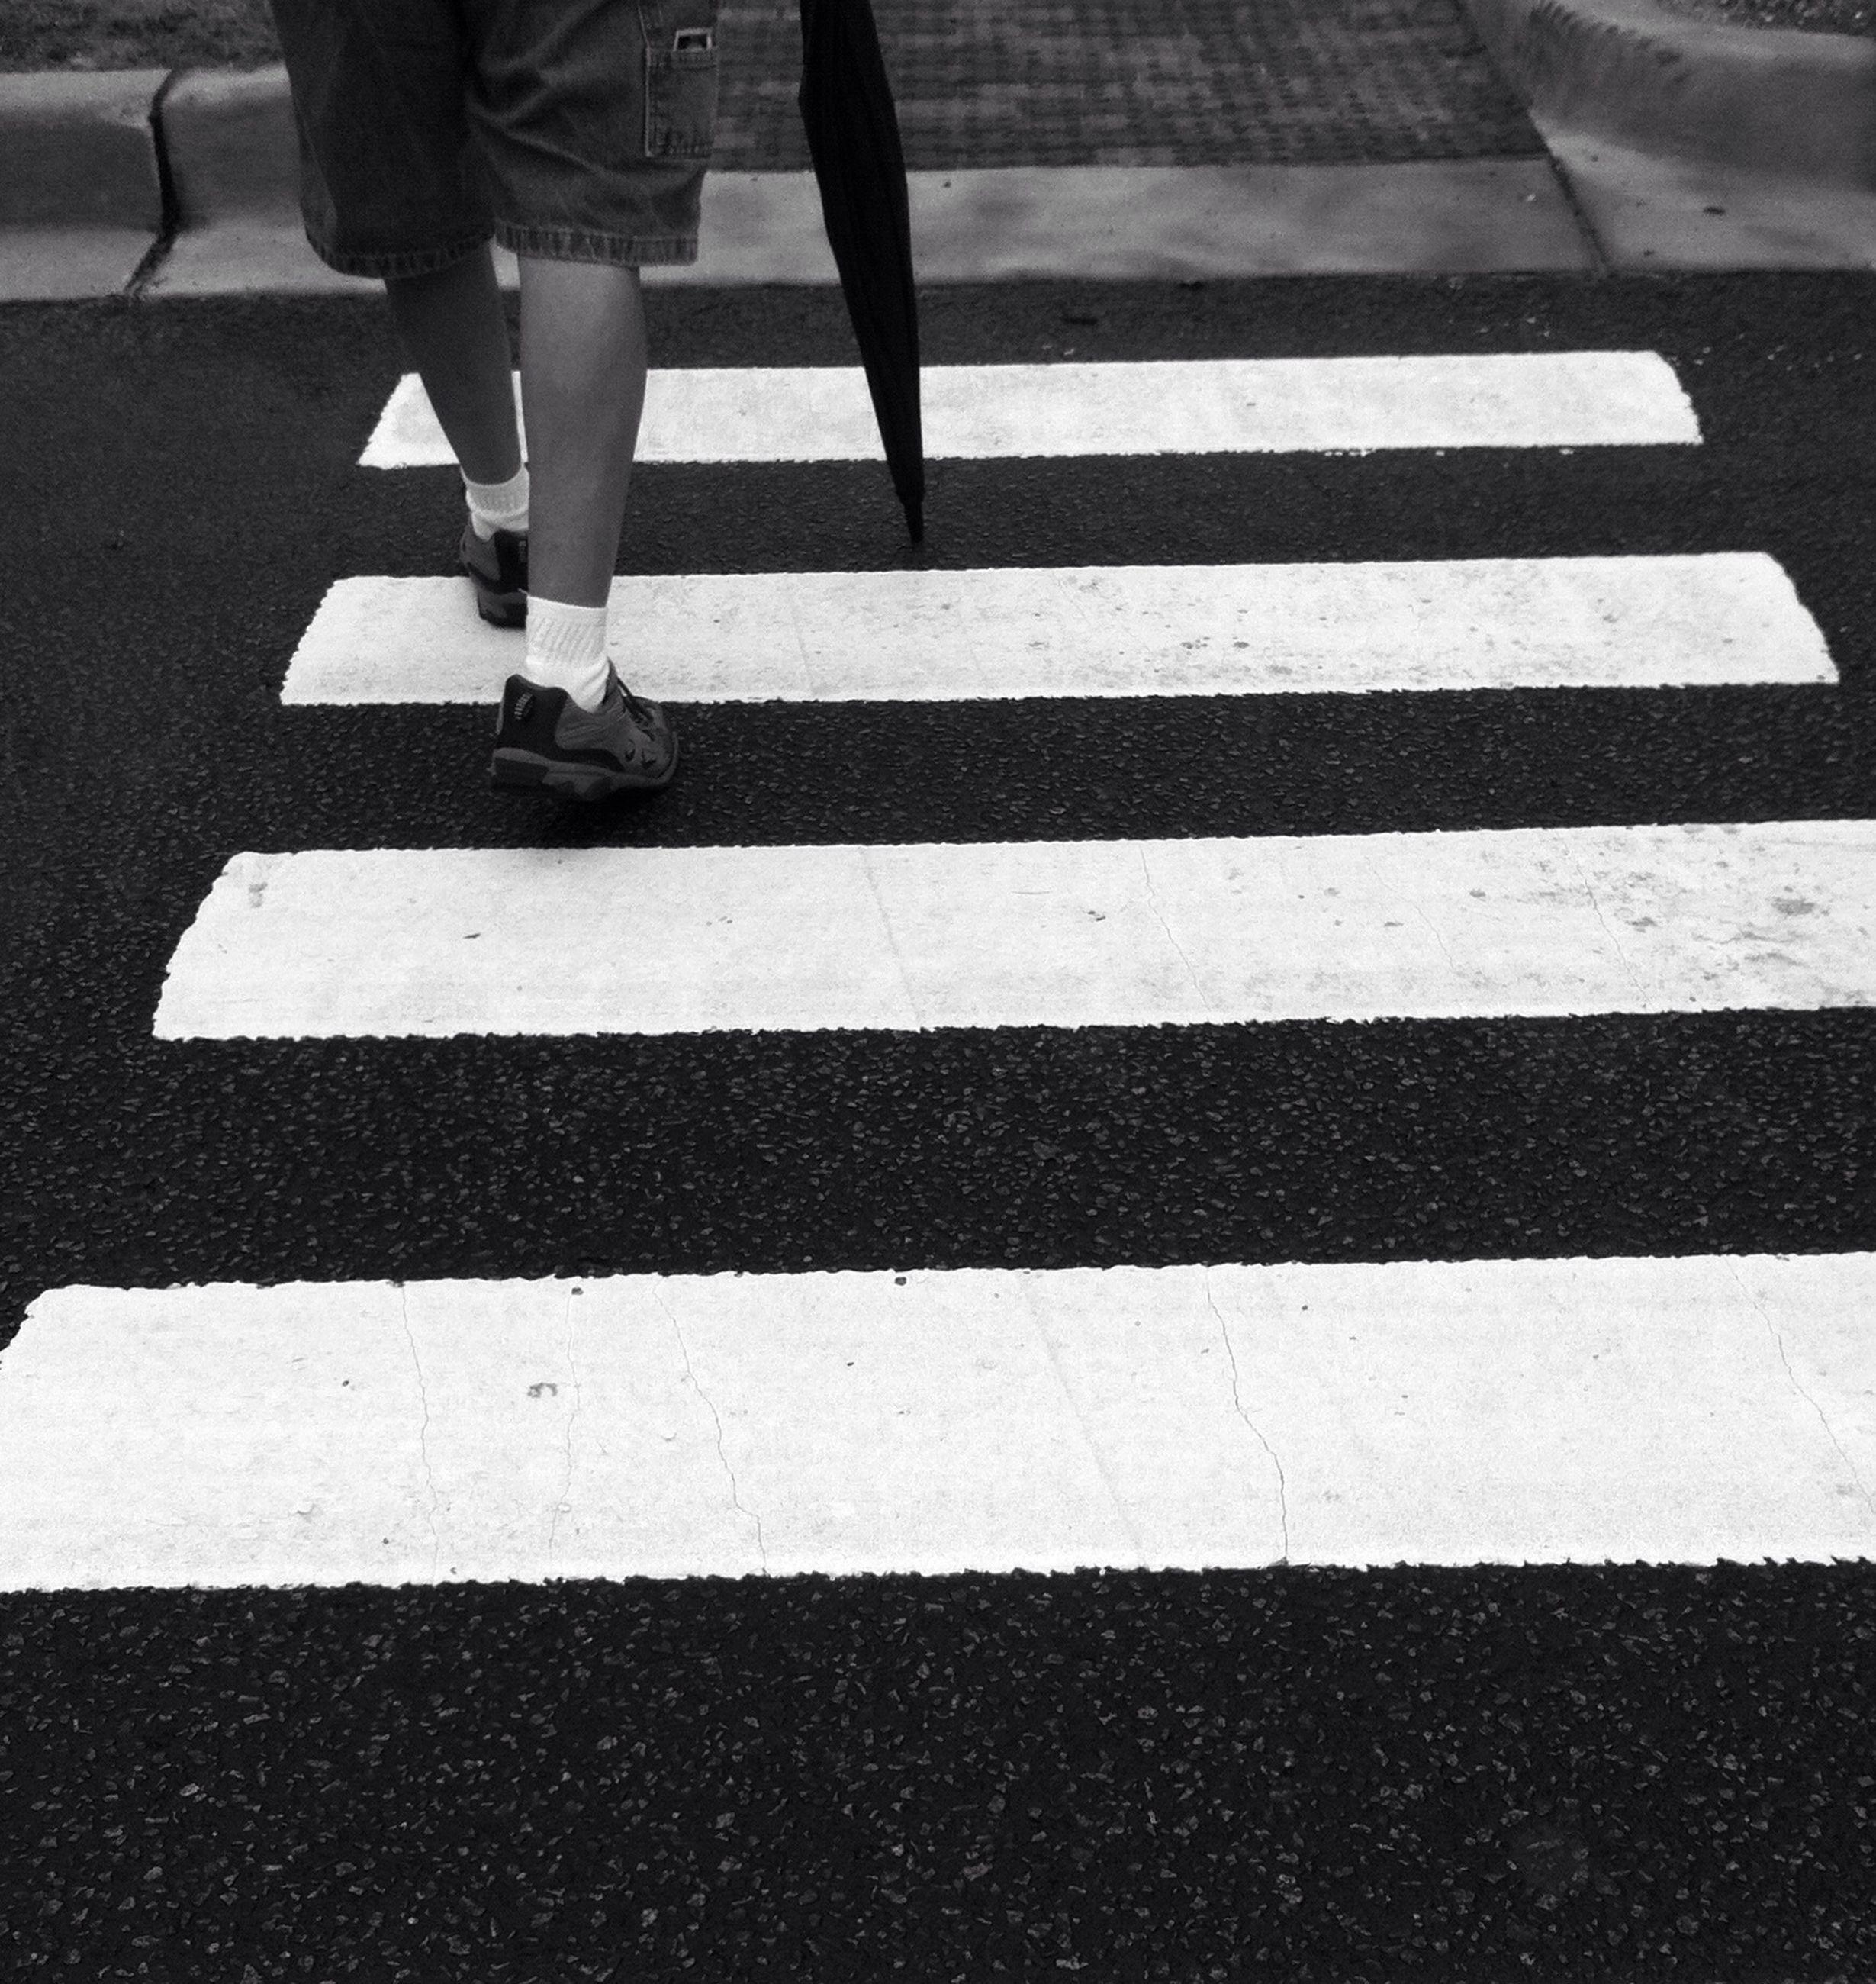 road marking, street, road, low section, transportation, zebra crossing, walking, men, lifestyles, asphalt, person, standing, crossing, crosswalk, leisure activity, day